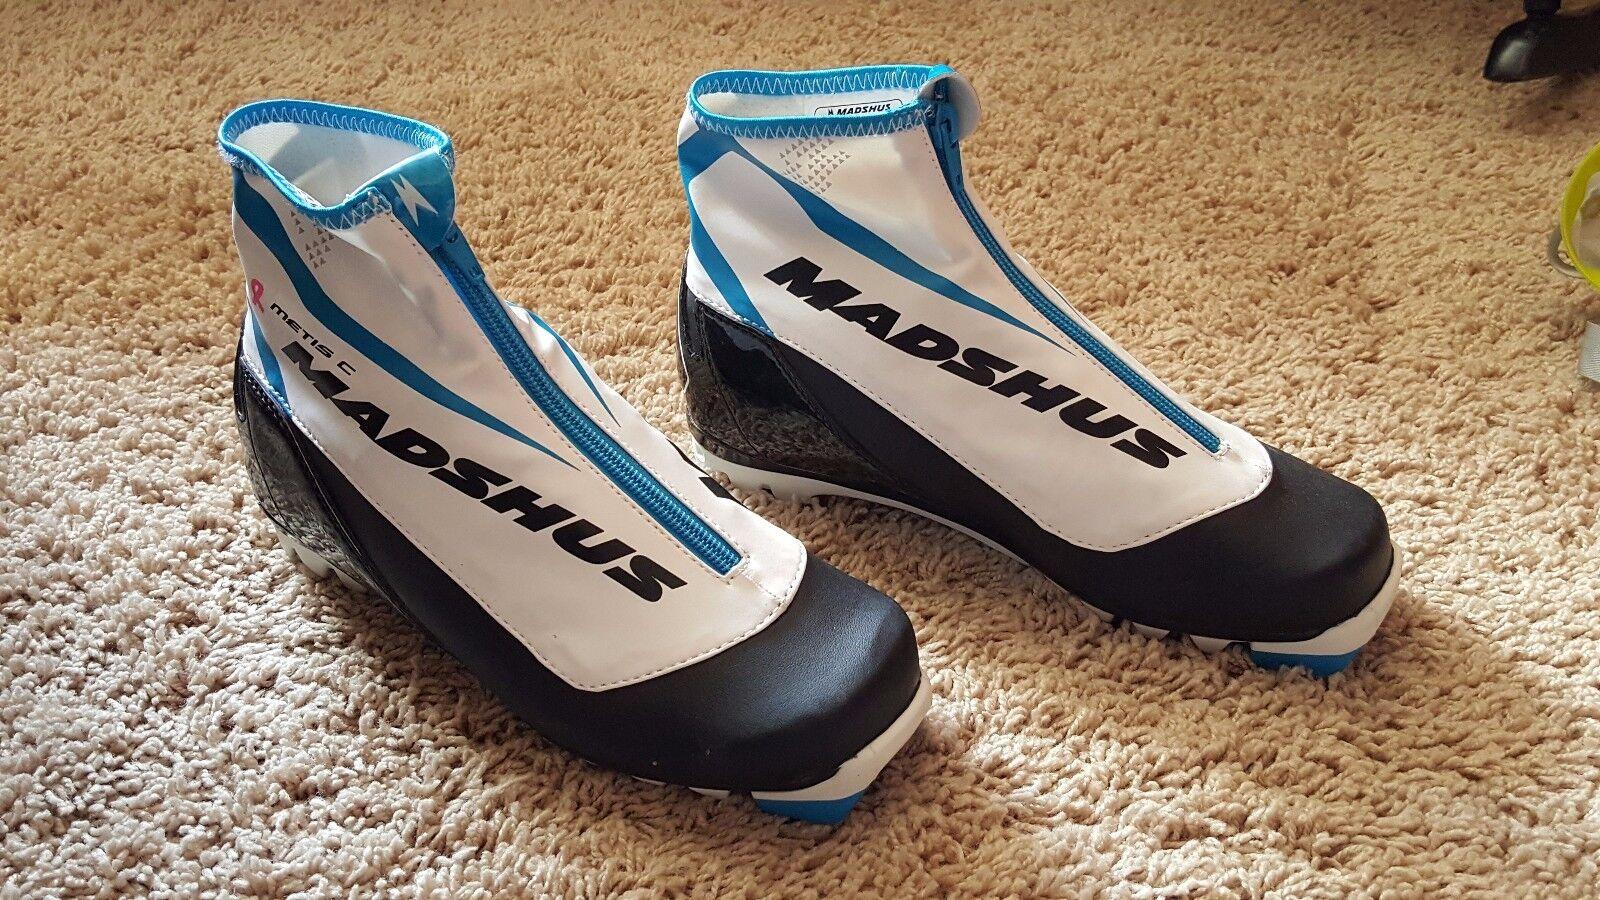 Madshus Classic C Metis cross-country ski boot, size 39